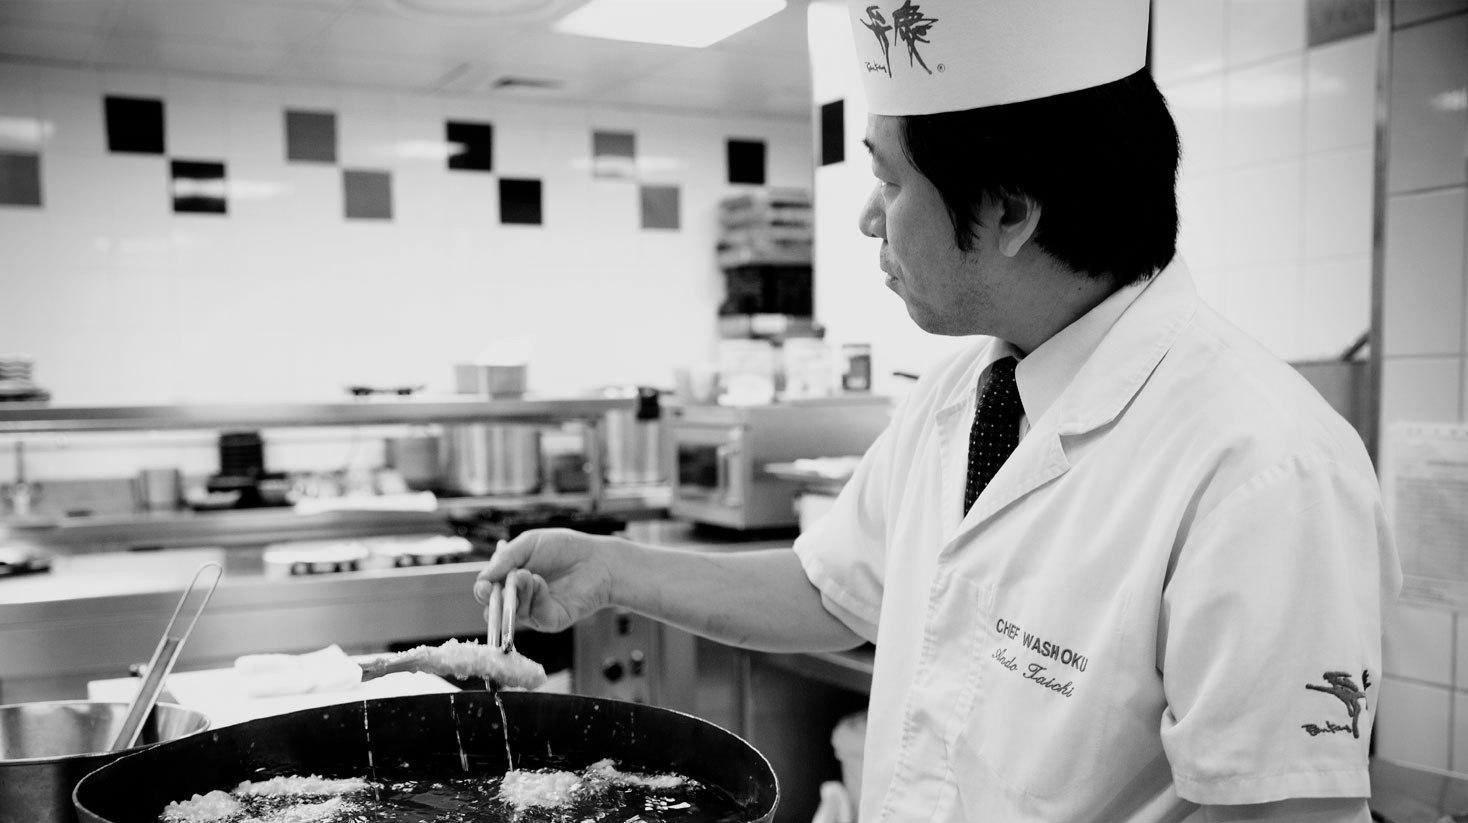 chef-washoku-benkay